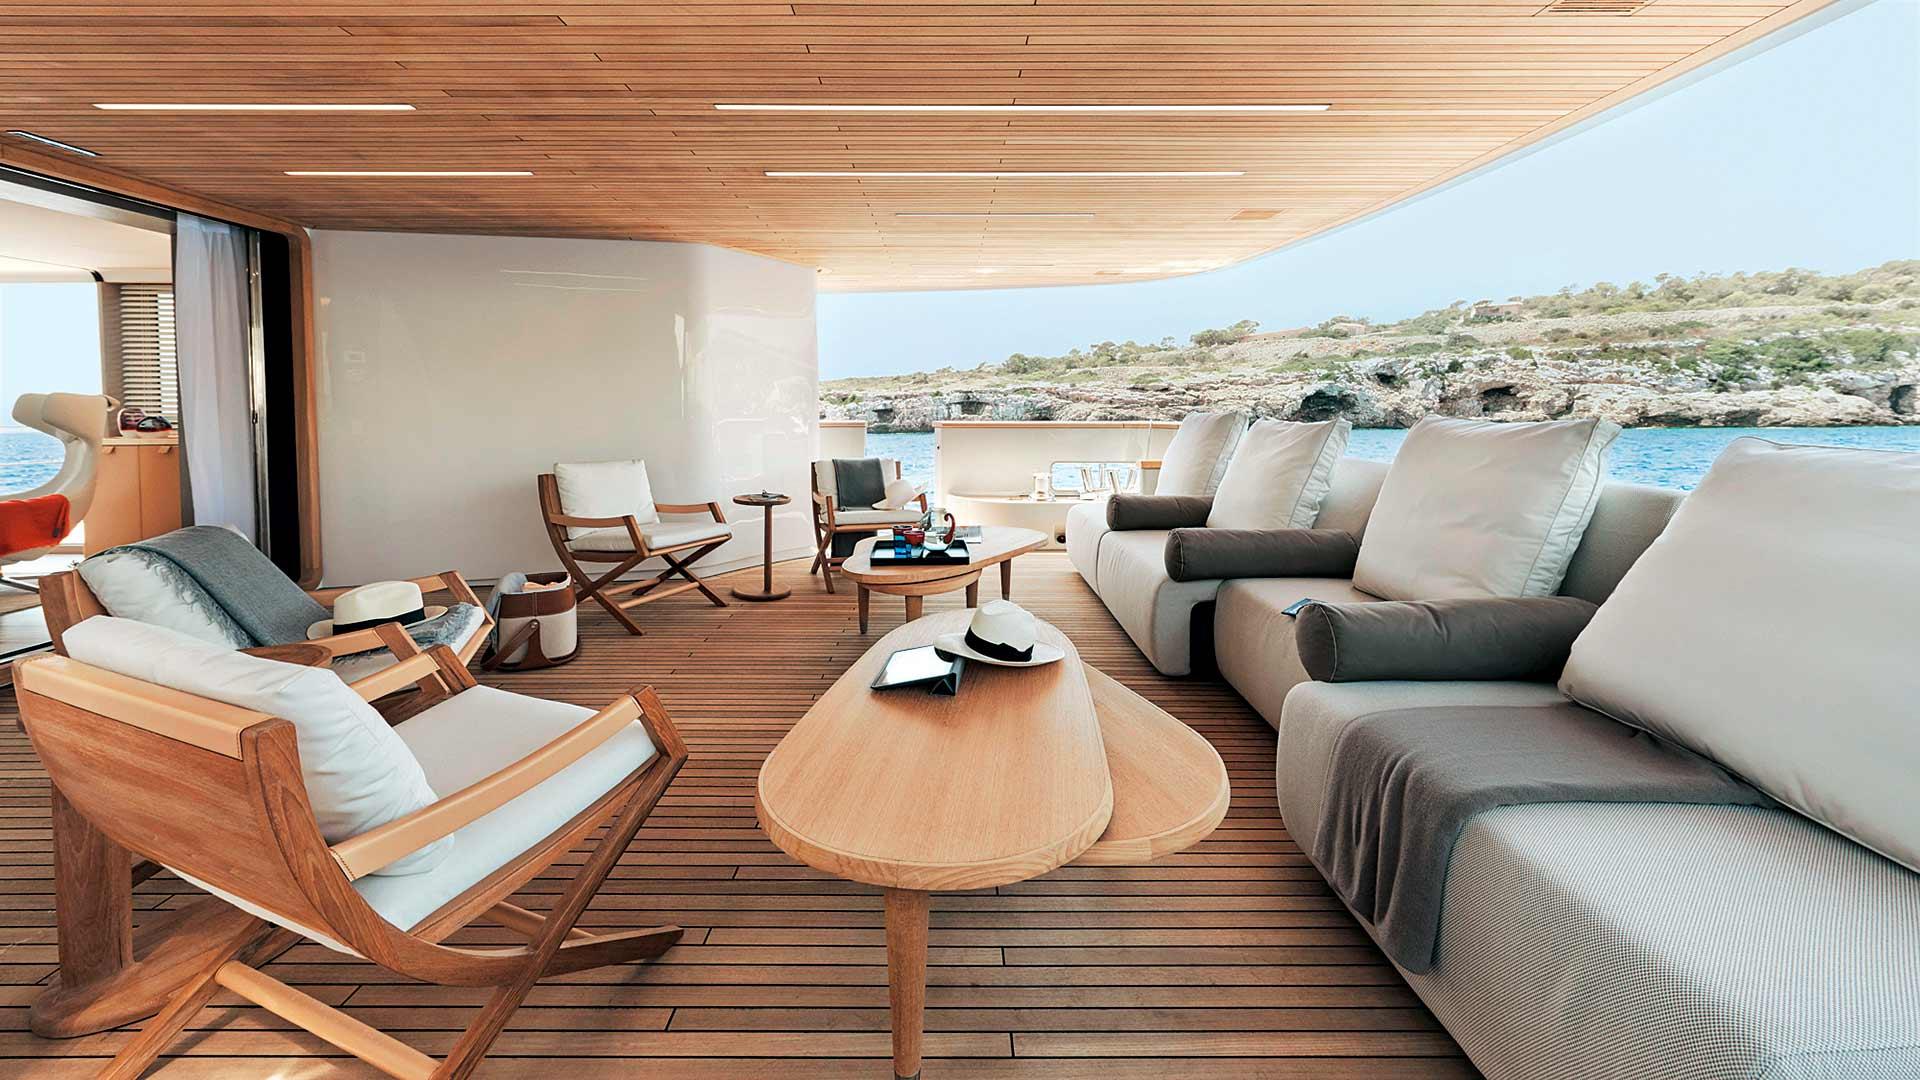 Sanlorenzoyachts france Blattes yachting